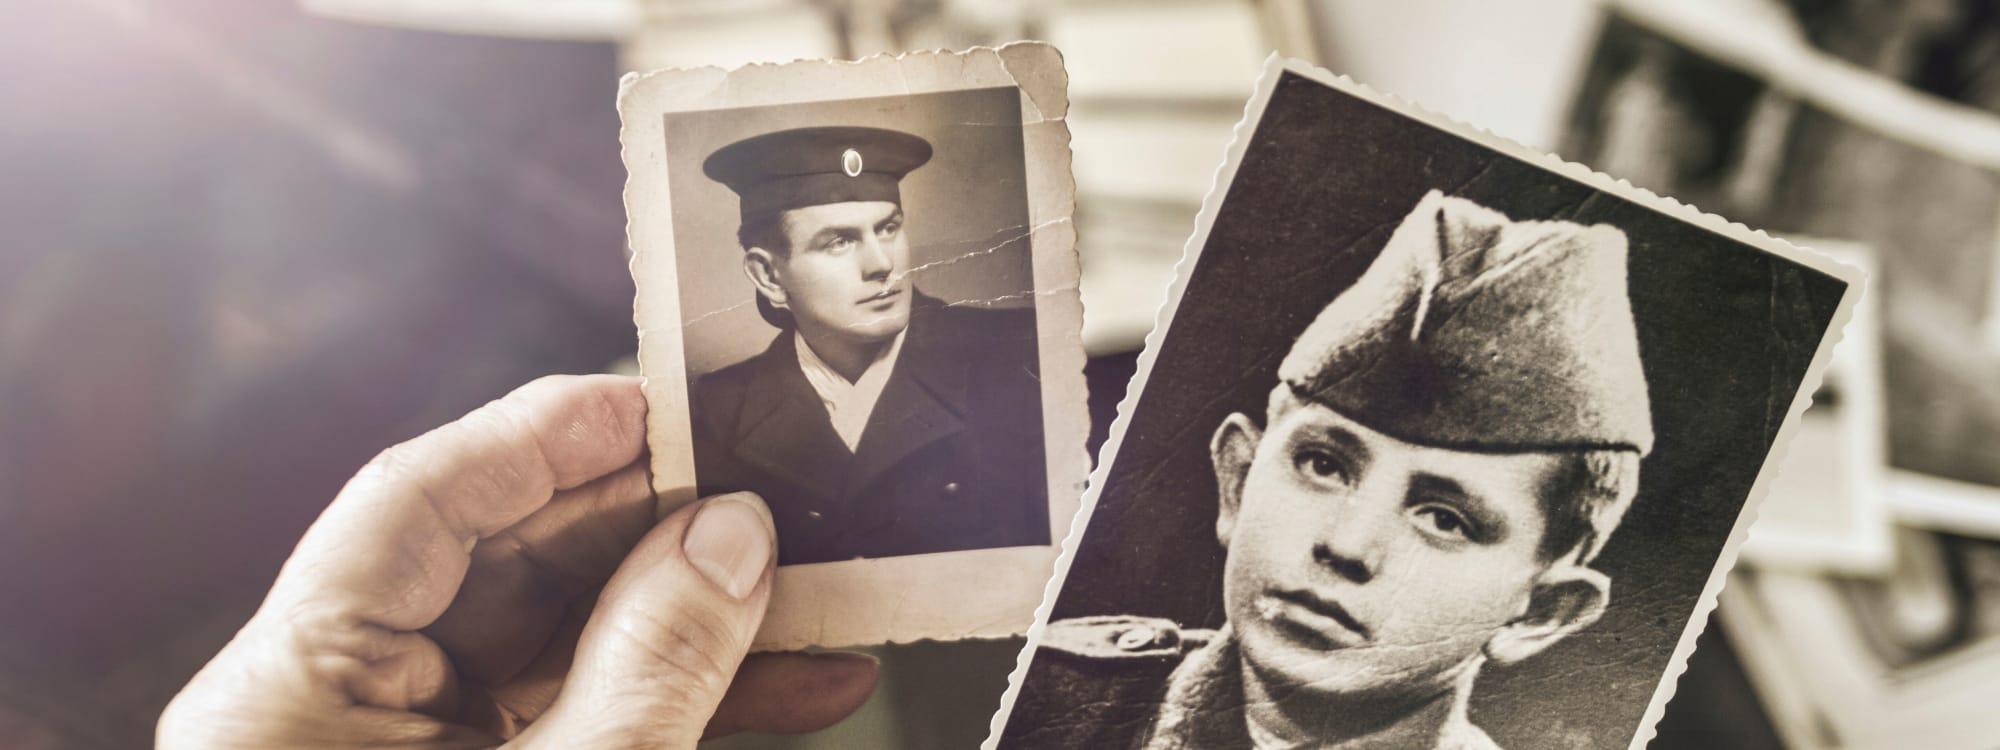 Memory care at Wellbrooke of Wabash in Wabash, Indiana